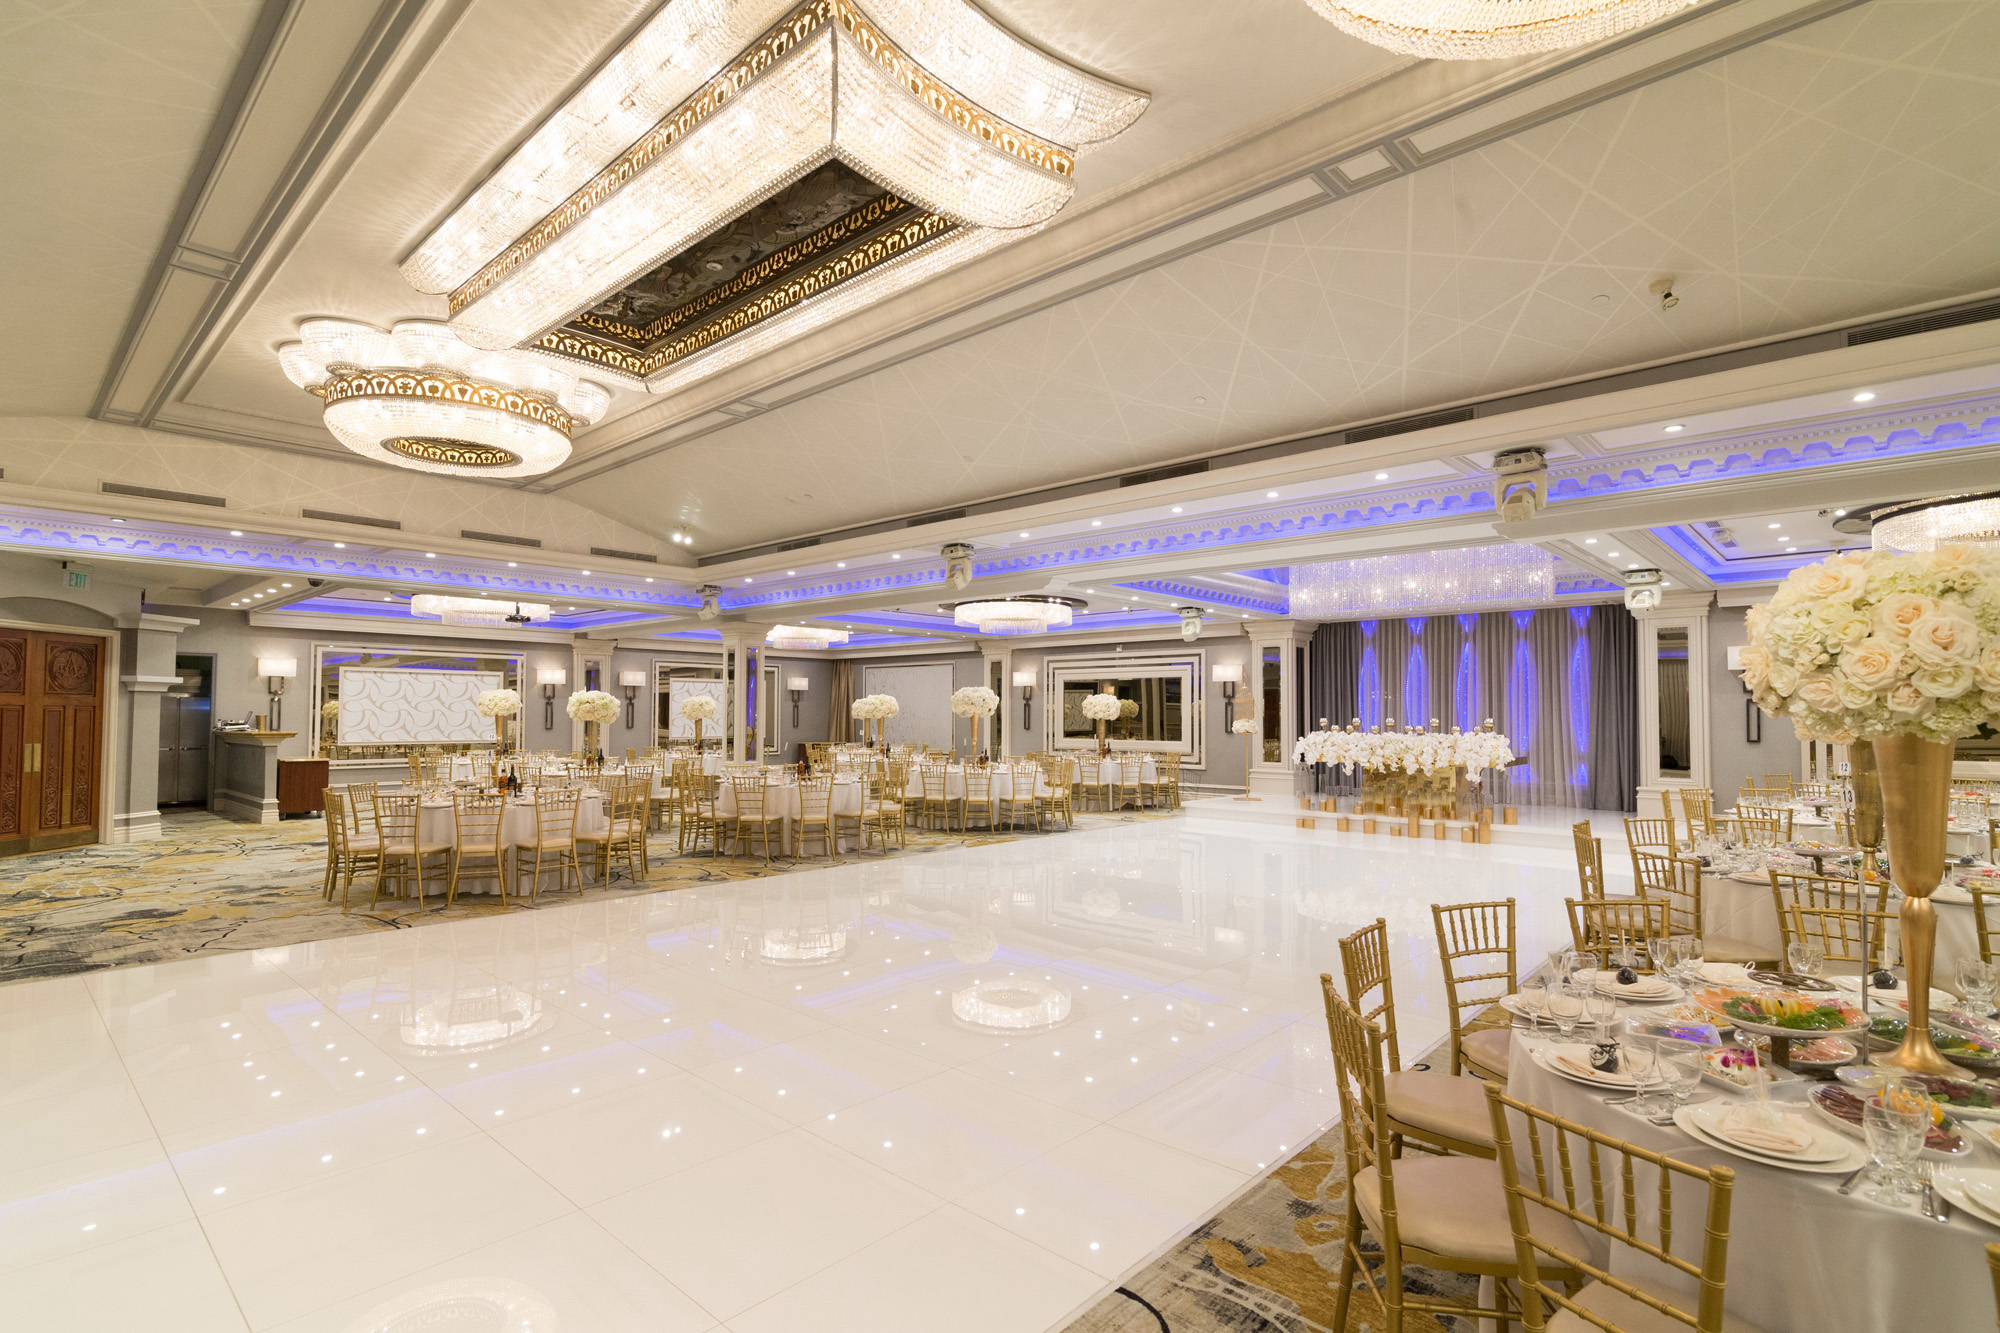 contemporary event wedding venues in glendale ca glenoaks ballroom